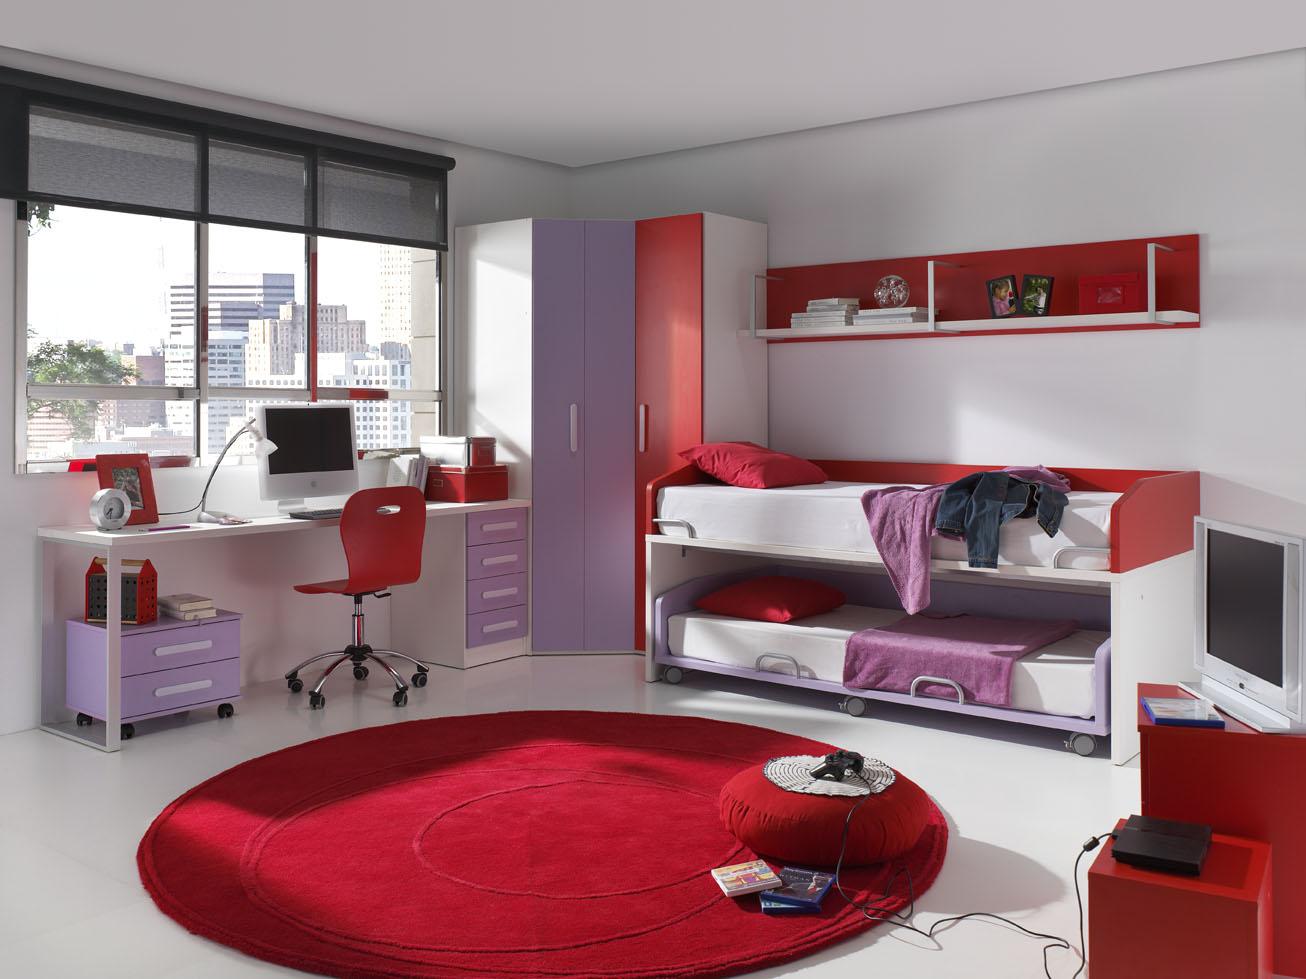 muebles orts base2 dormitorio juvenil